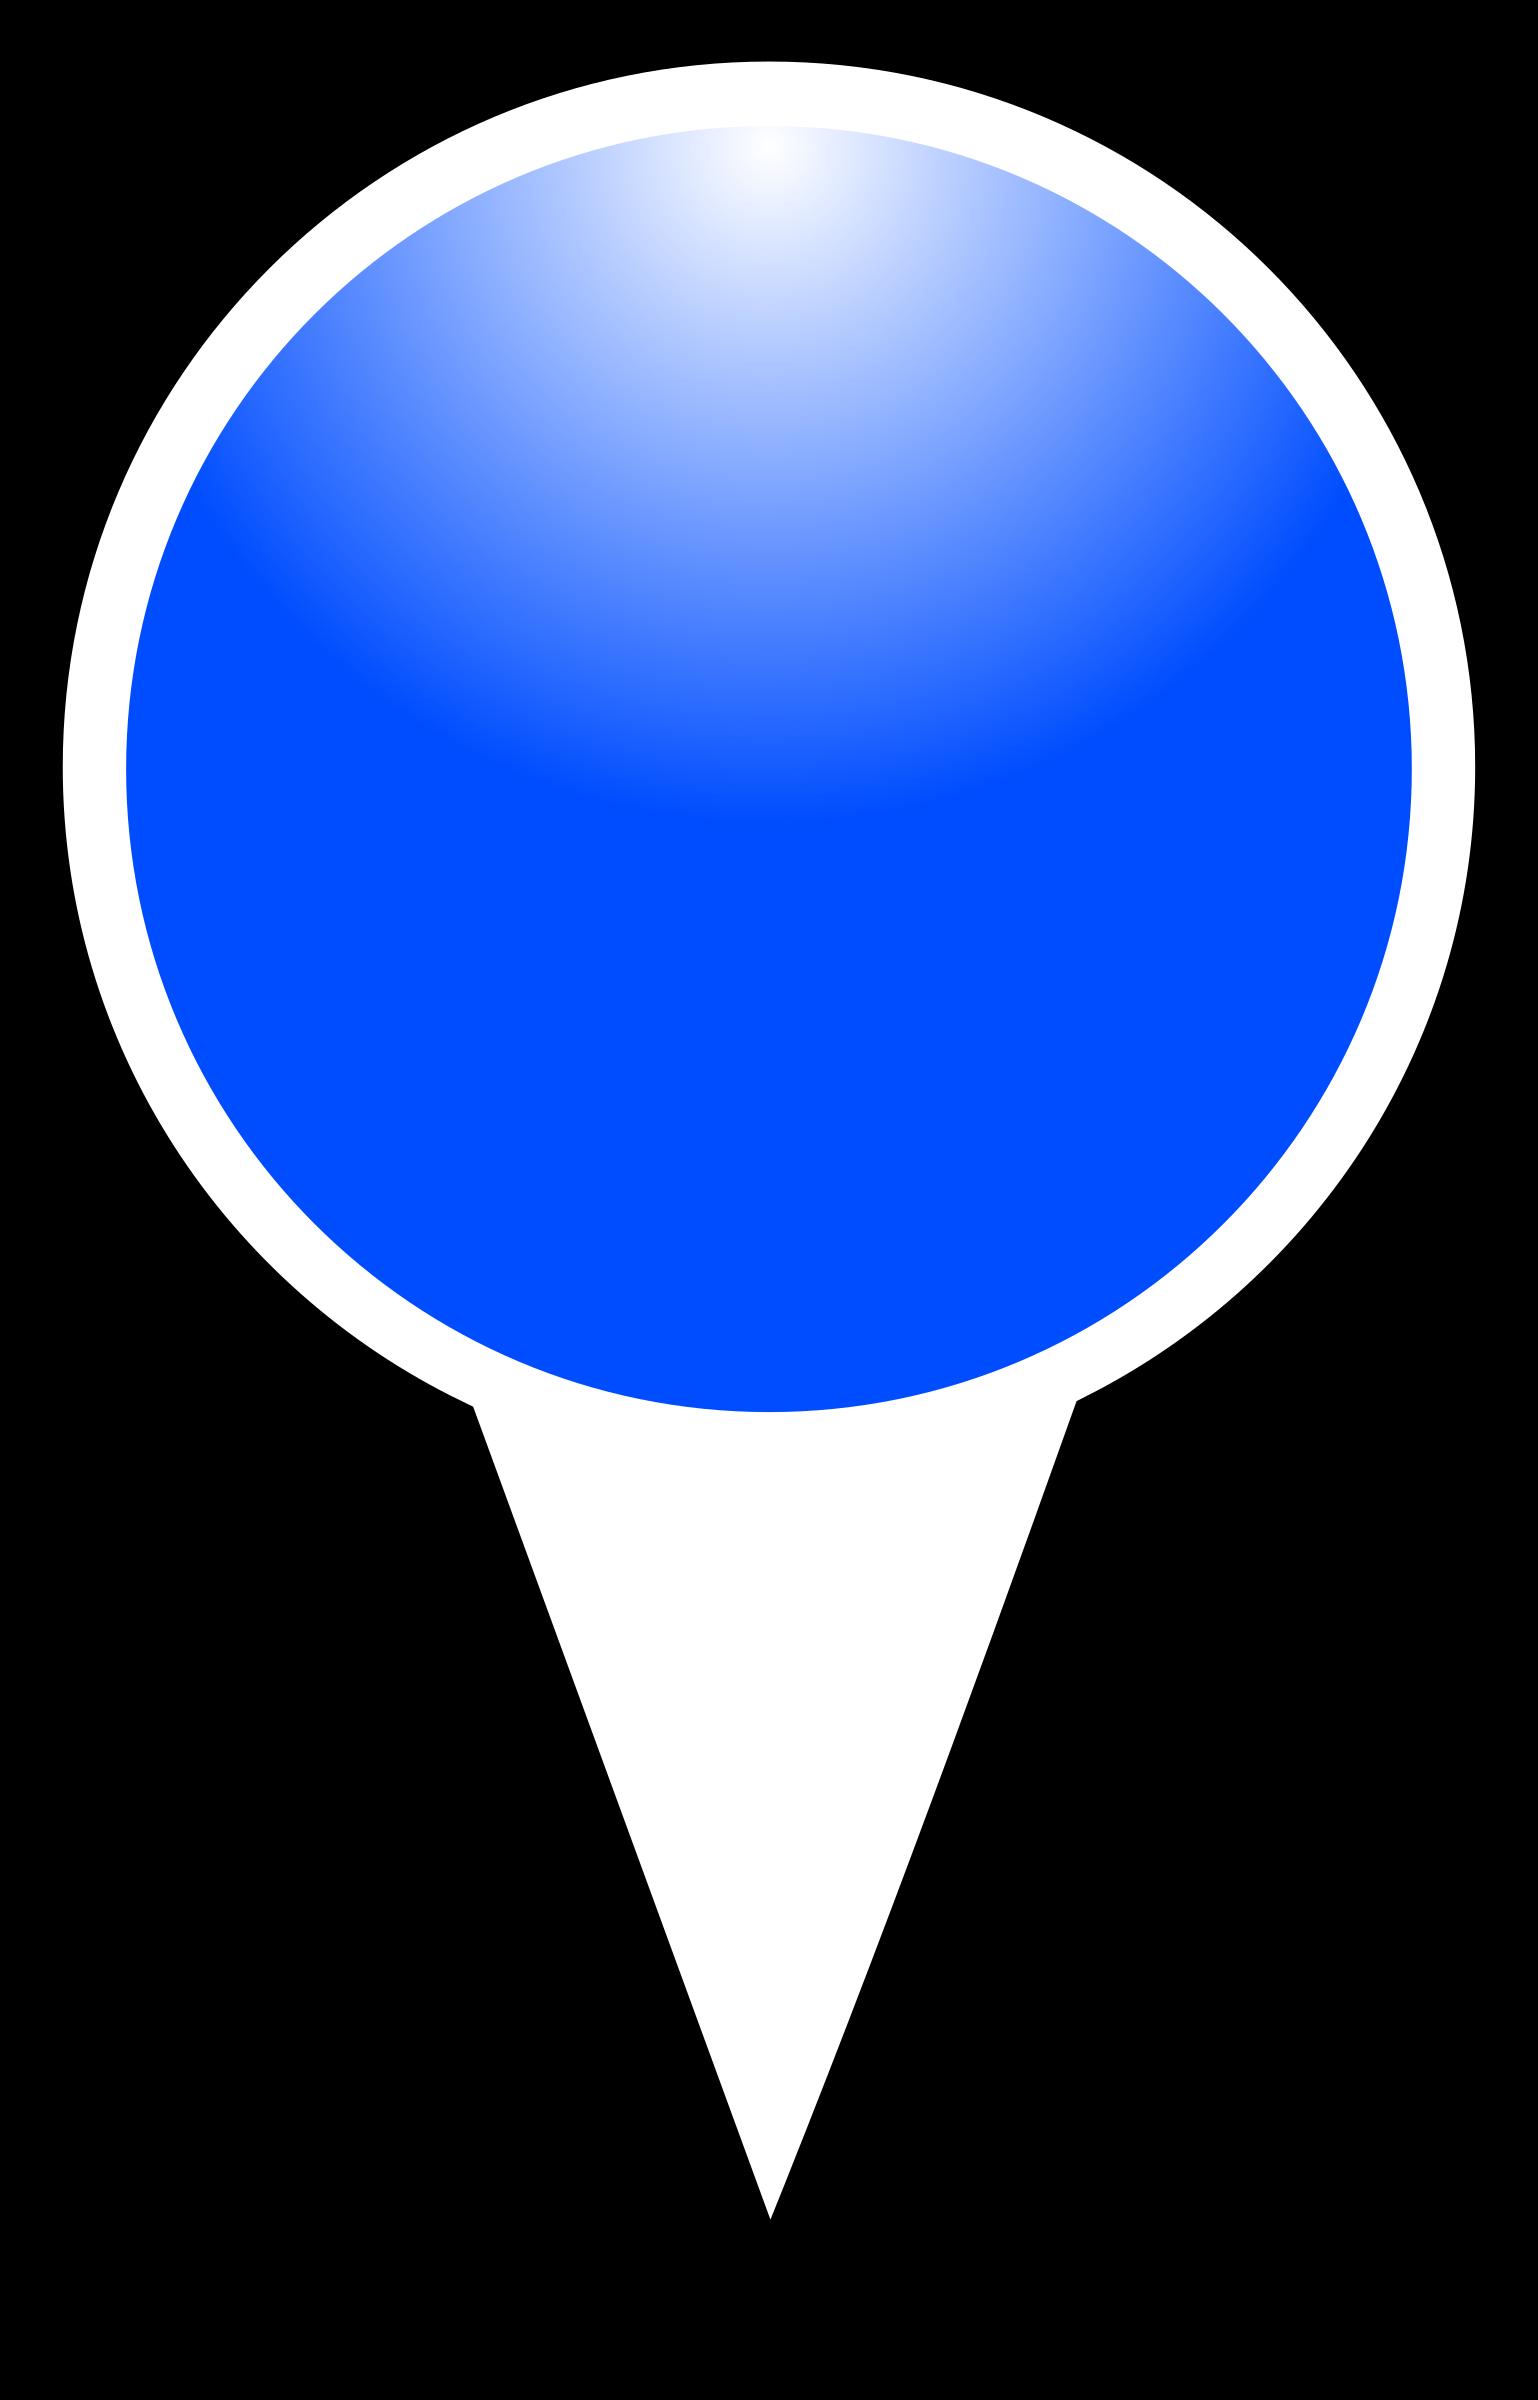 Squat marker big image. Maps clipart blue